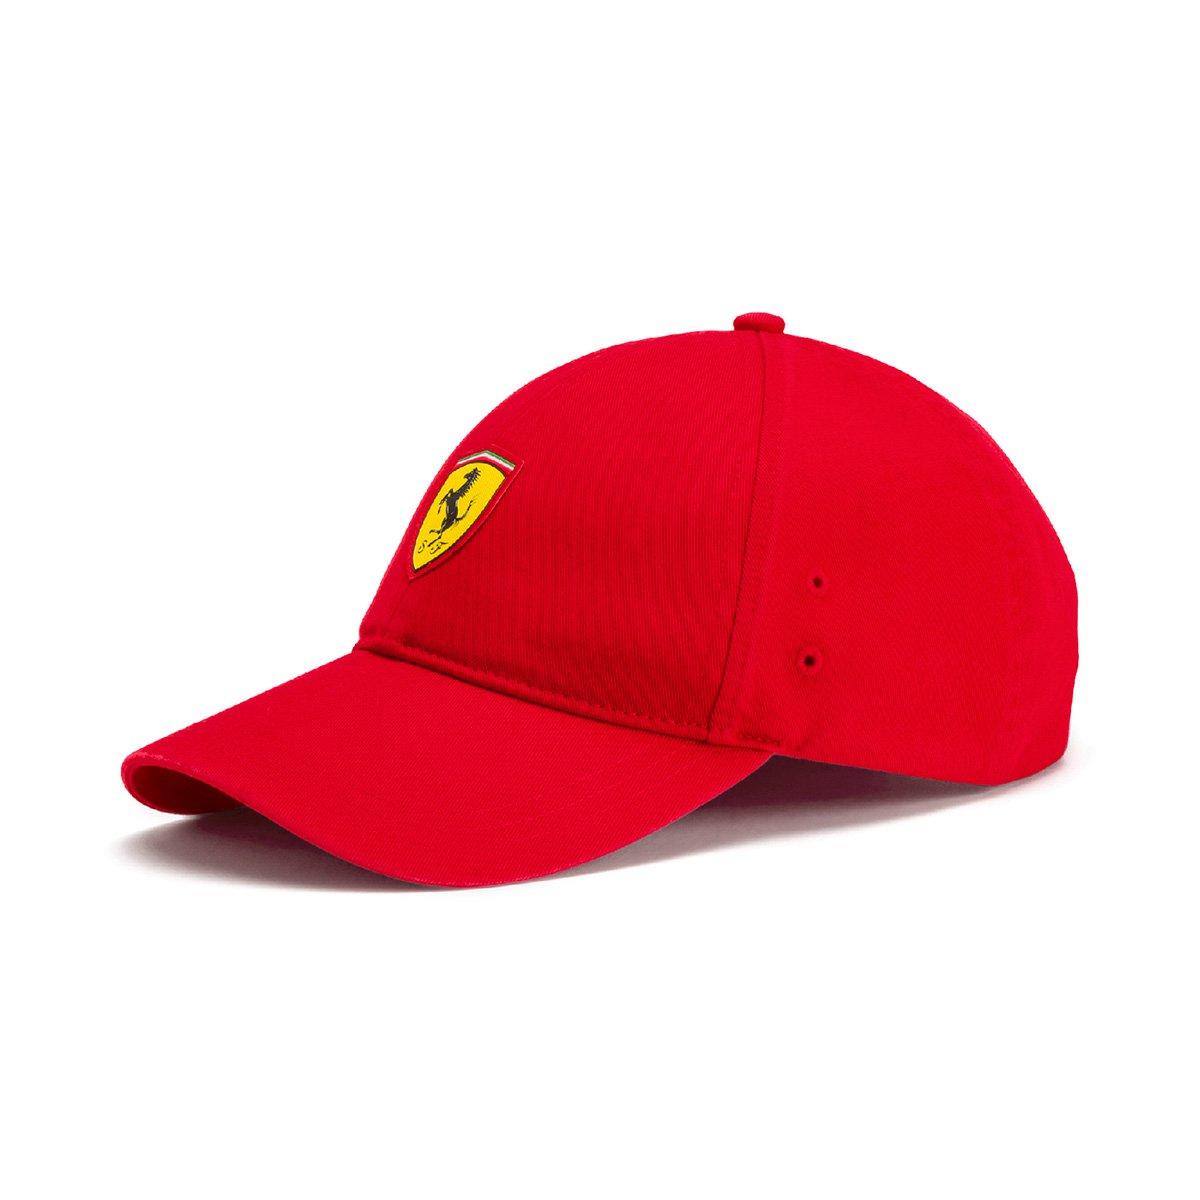 Boné Puma Scuderia Ferrari Aba Curva Fanwear BB Masculino - Vermelho -  Compre Agora  df1517cea11